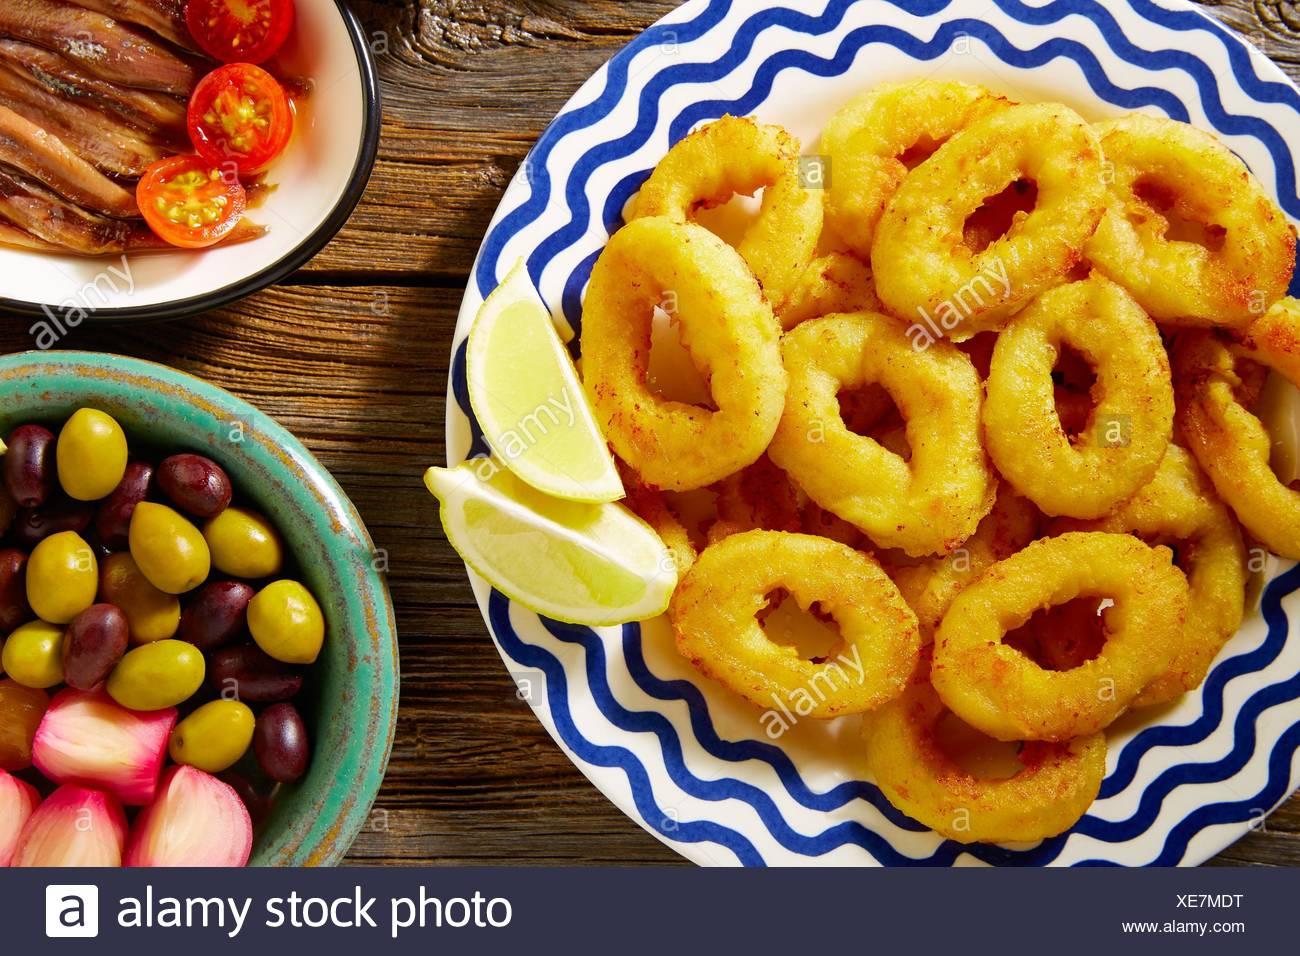 Tapas spanish seafood fried calamari spain. - Stock Image